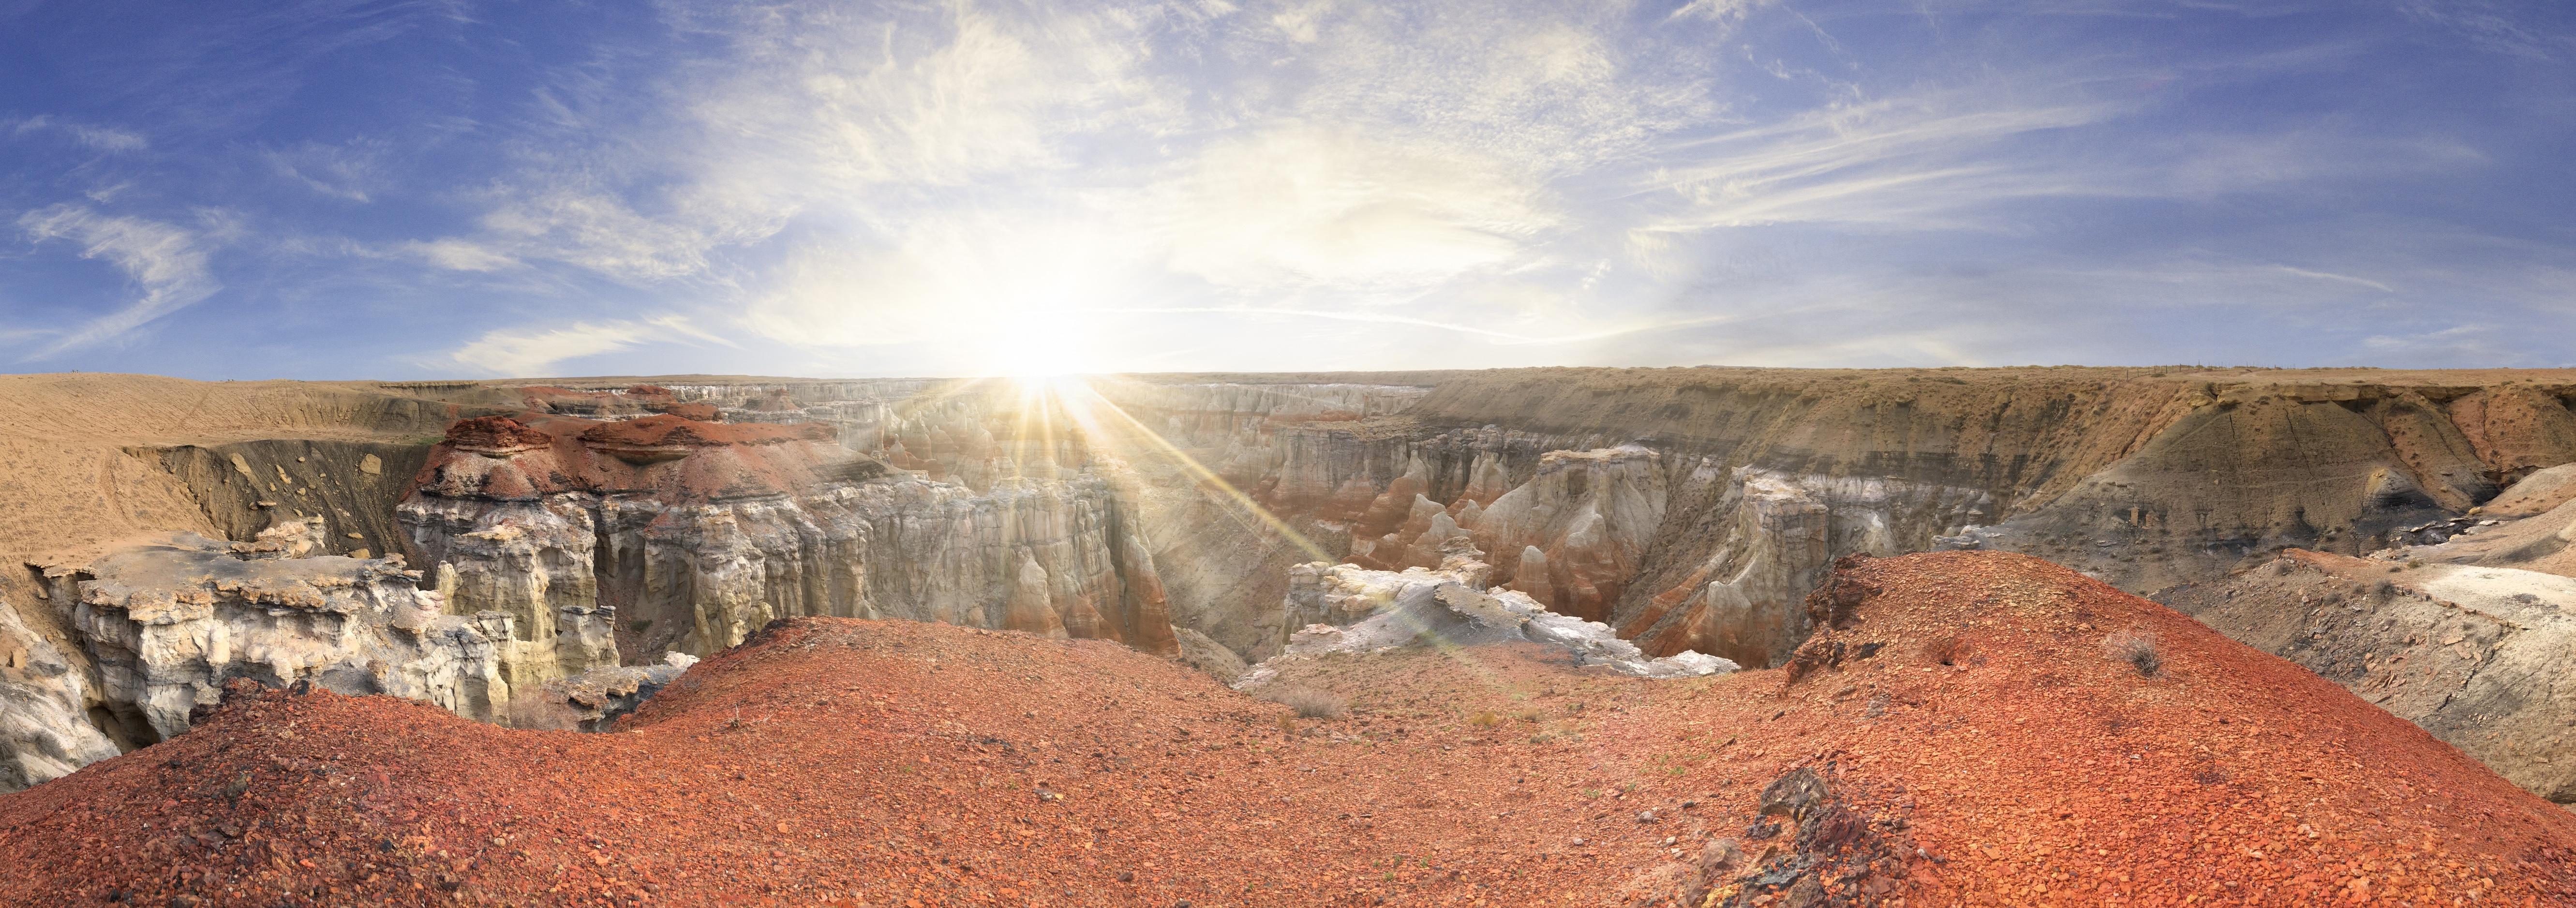 Panorama Usa Canyon Sunbeam Rock 5325x1877